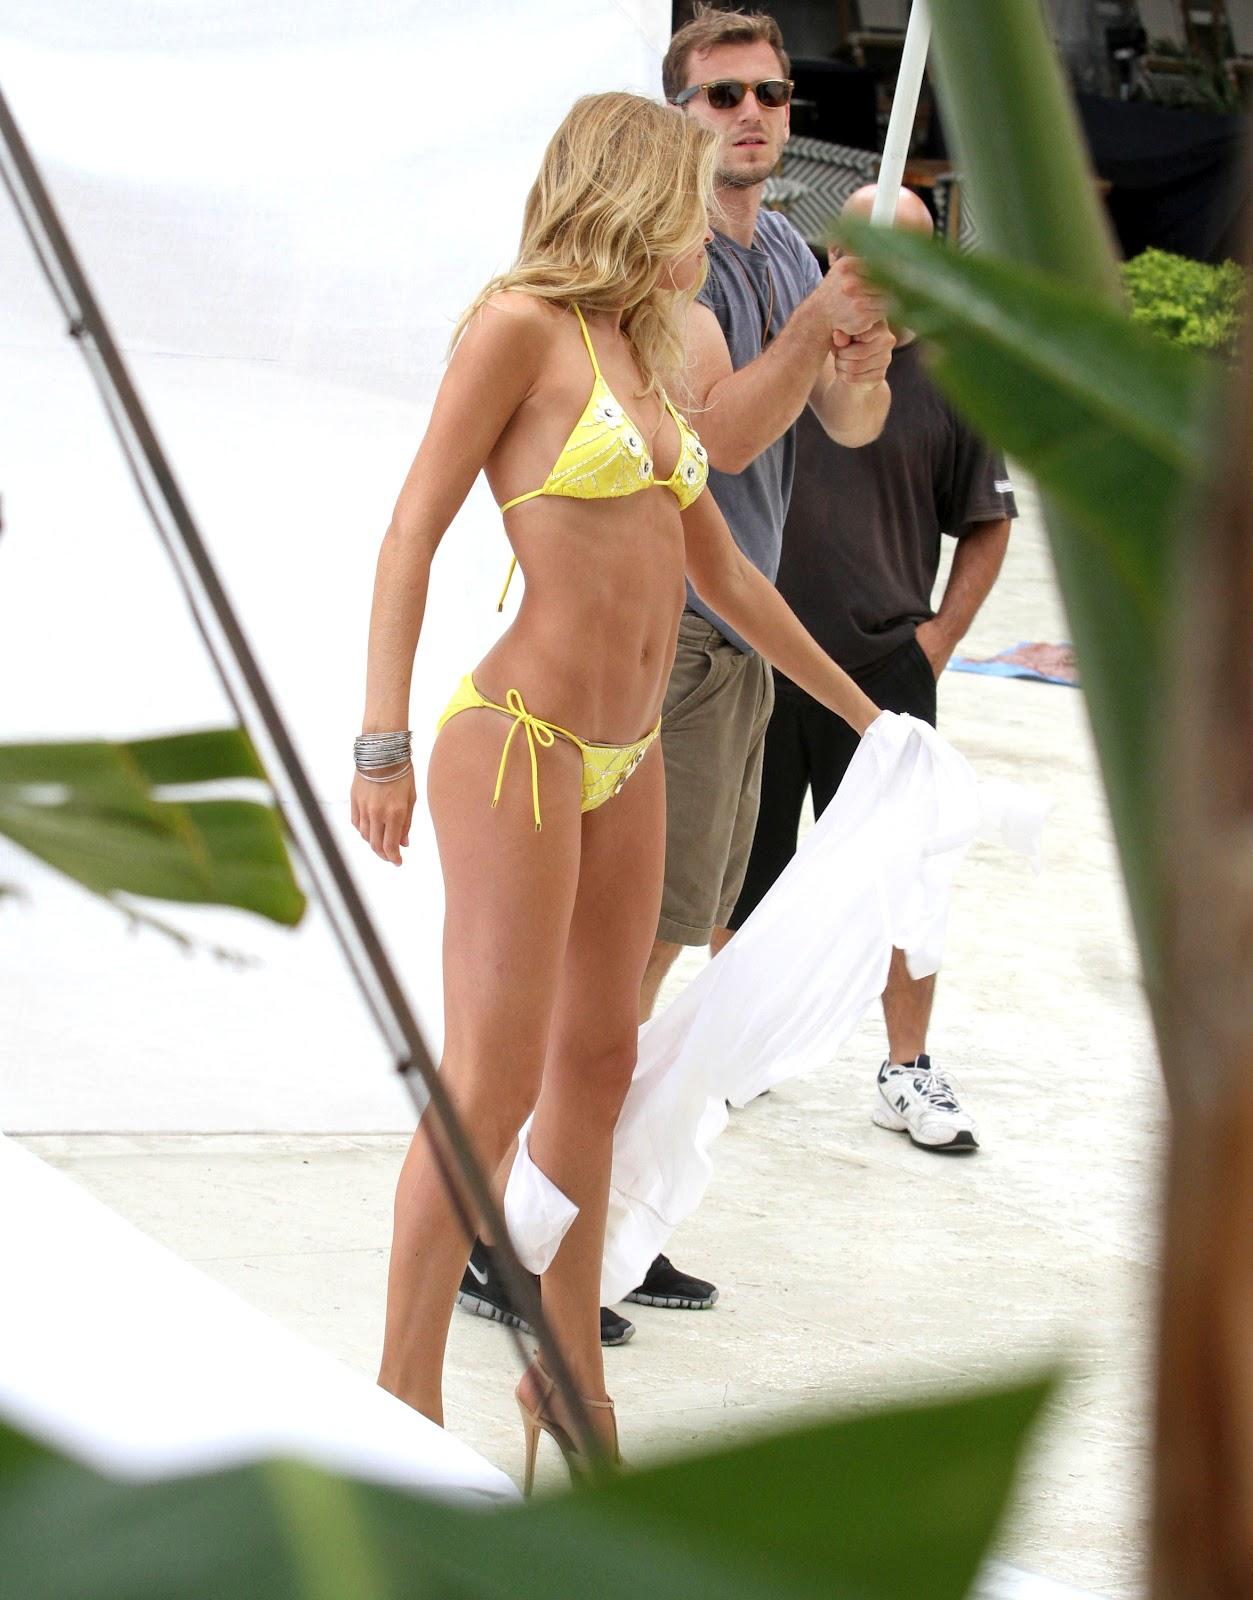 http://4.bp.blogspot.com/-mqIs9e2qkf8/UGBdhpFudQI/AAAAAAAAO_8/D6jASJtmaac/s1600/Doutzen+Kroes+yellow+Bikini+Photoshoot+in+Miami+Sept+2012+-01.jpg